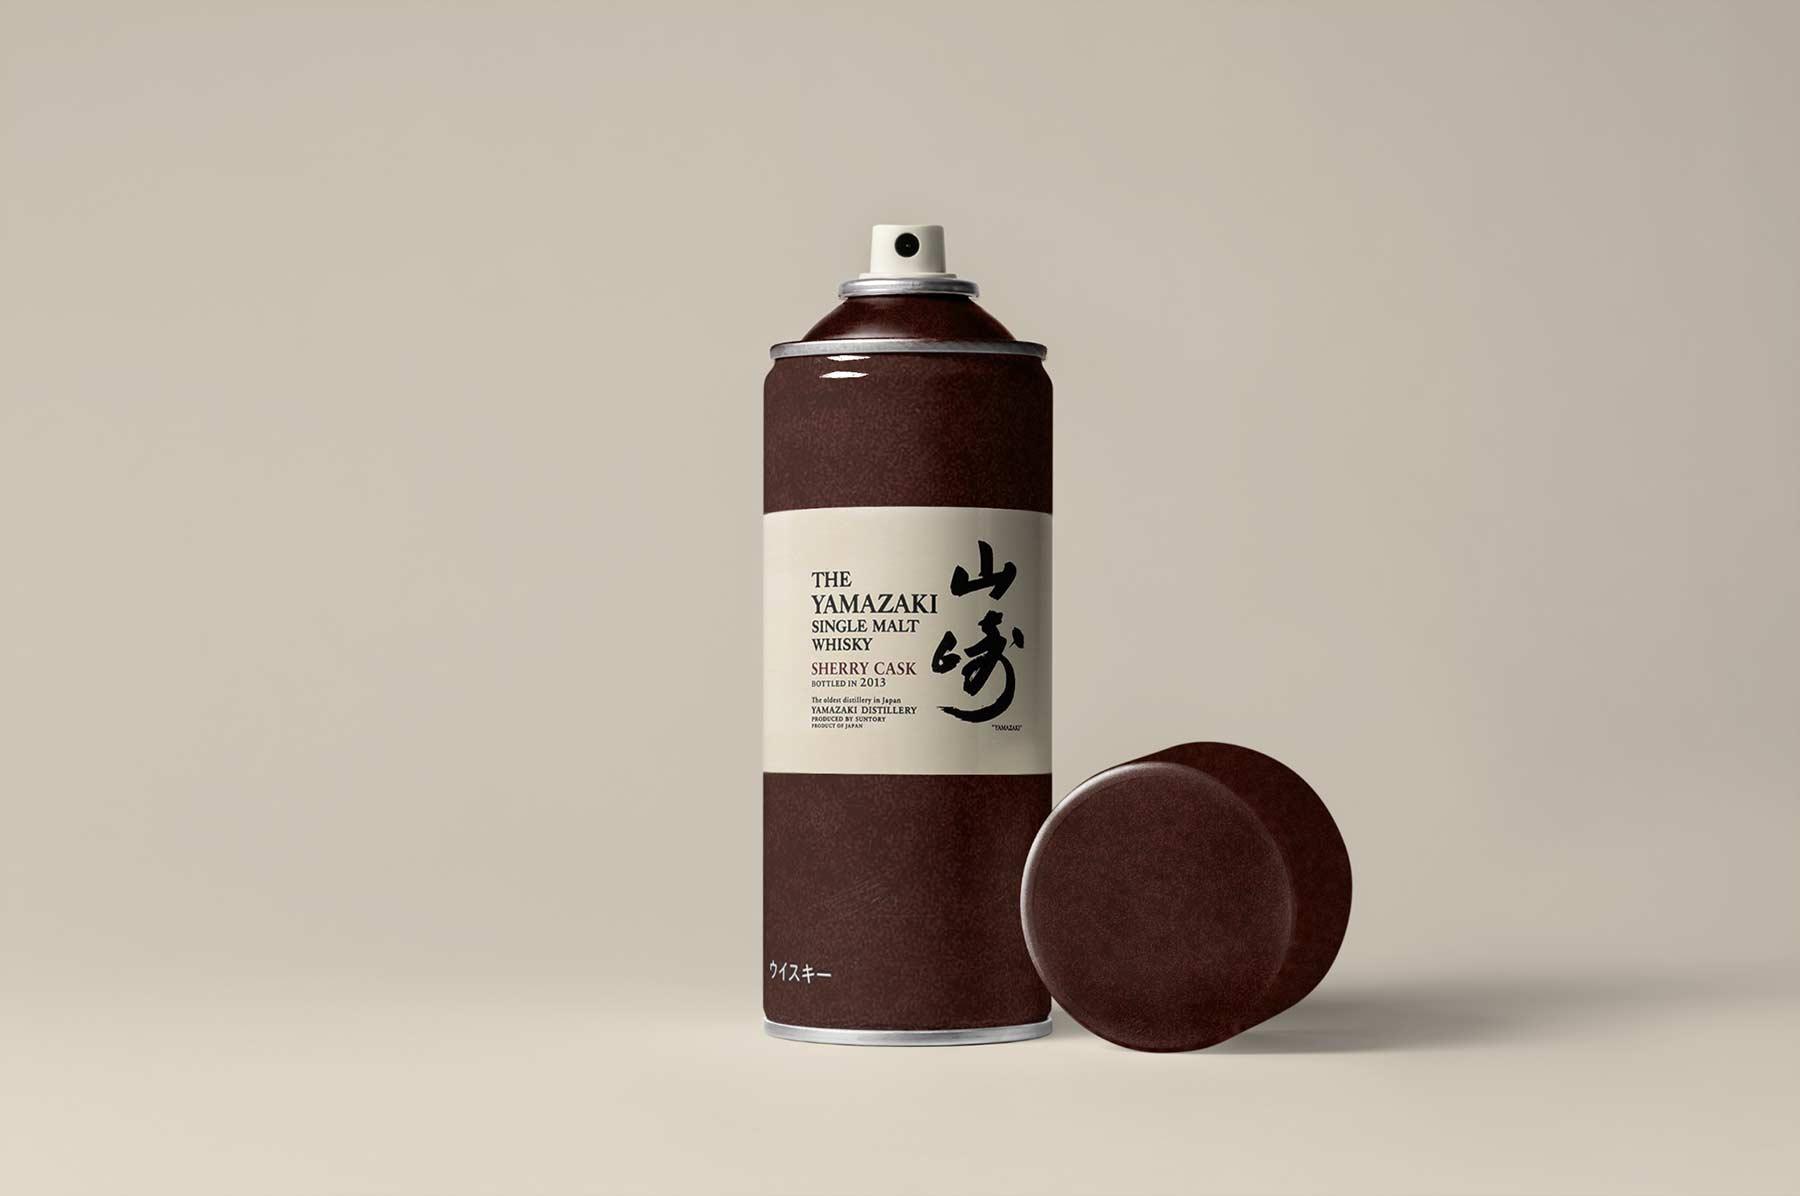 Luxus-Spraydosen Nouveau-Riche-luxus-farbdosen_07